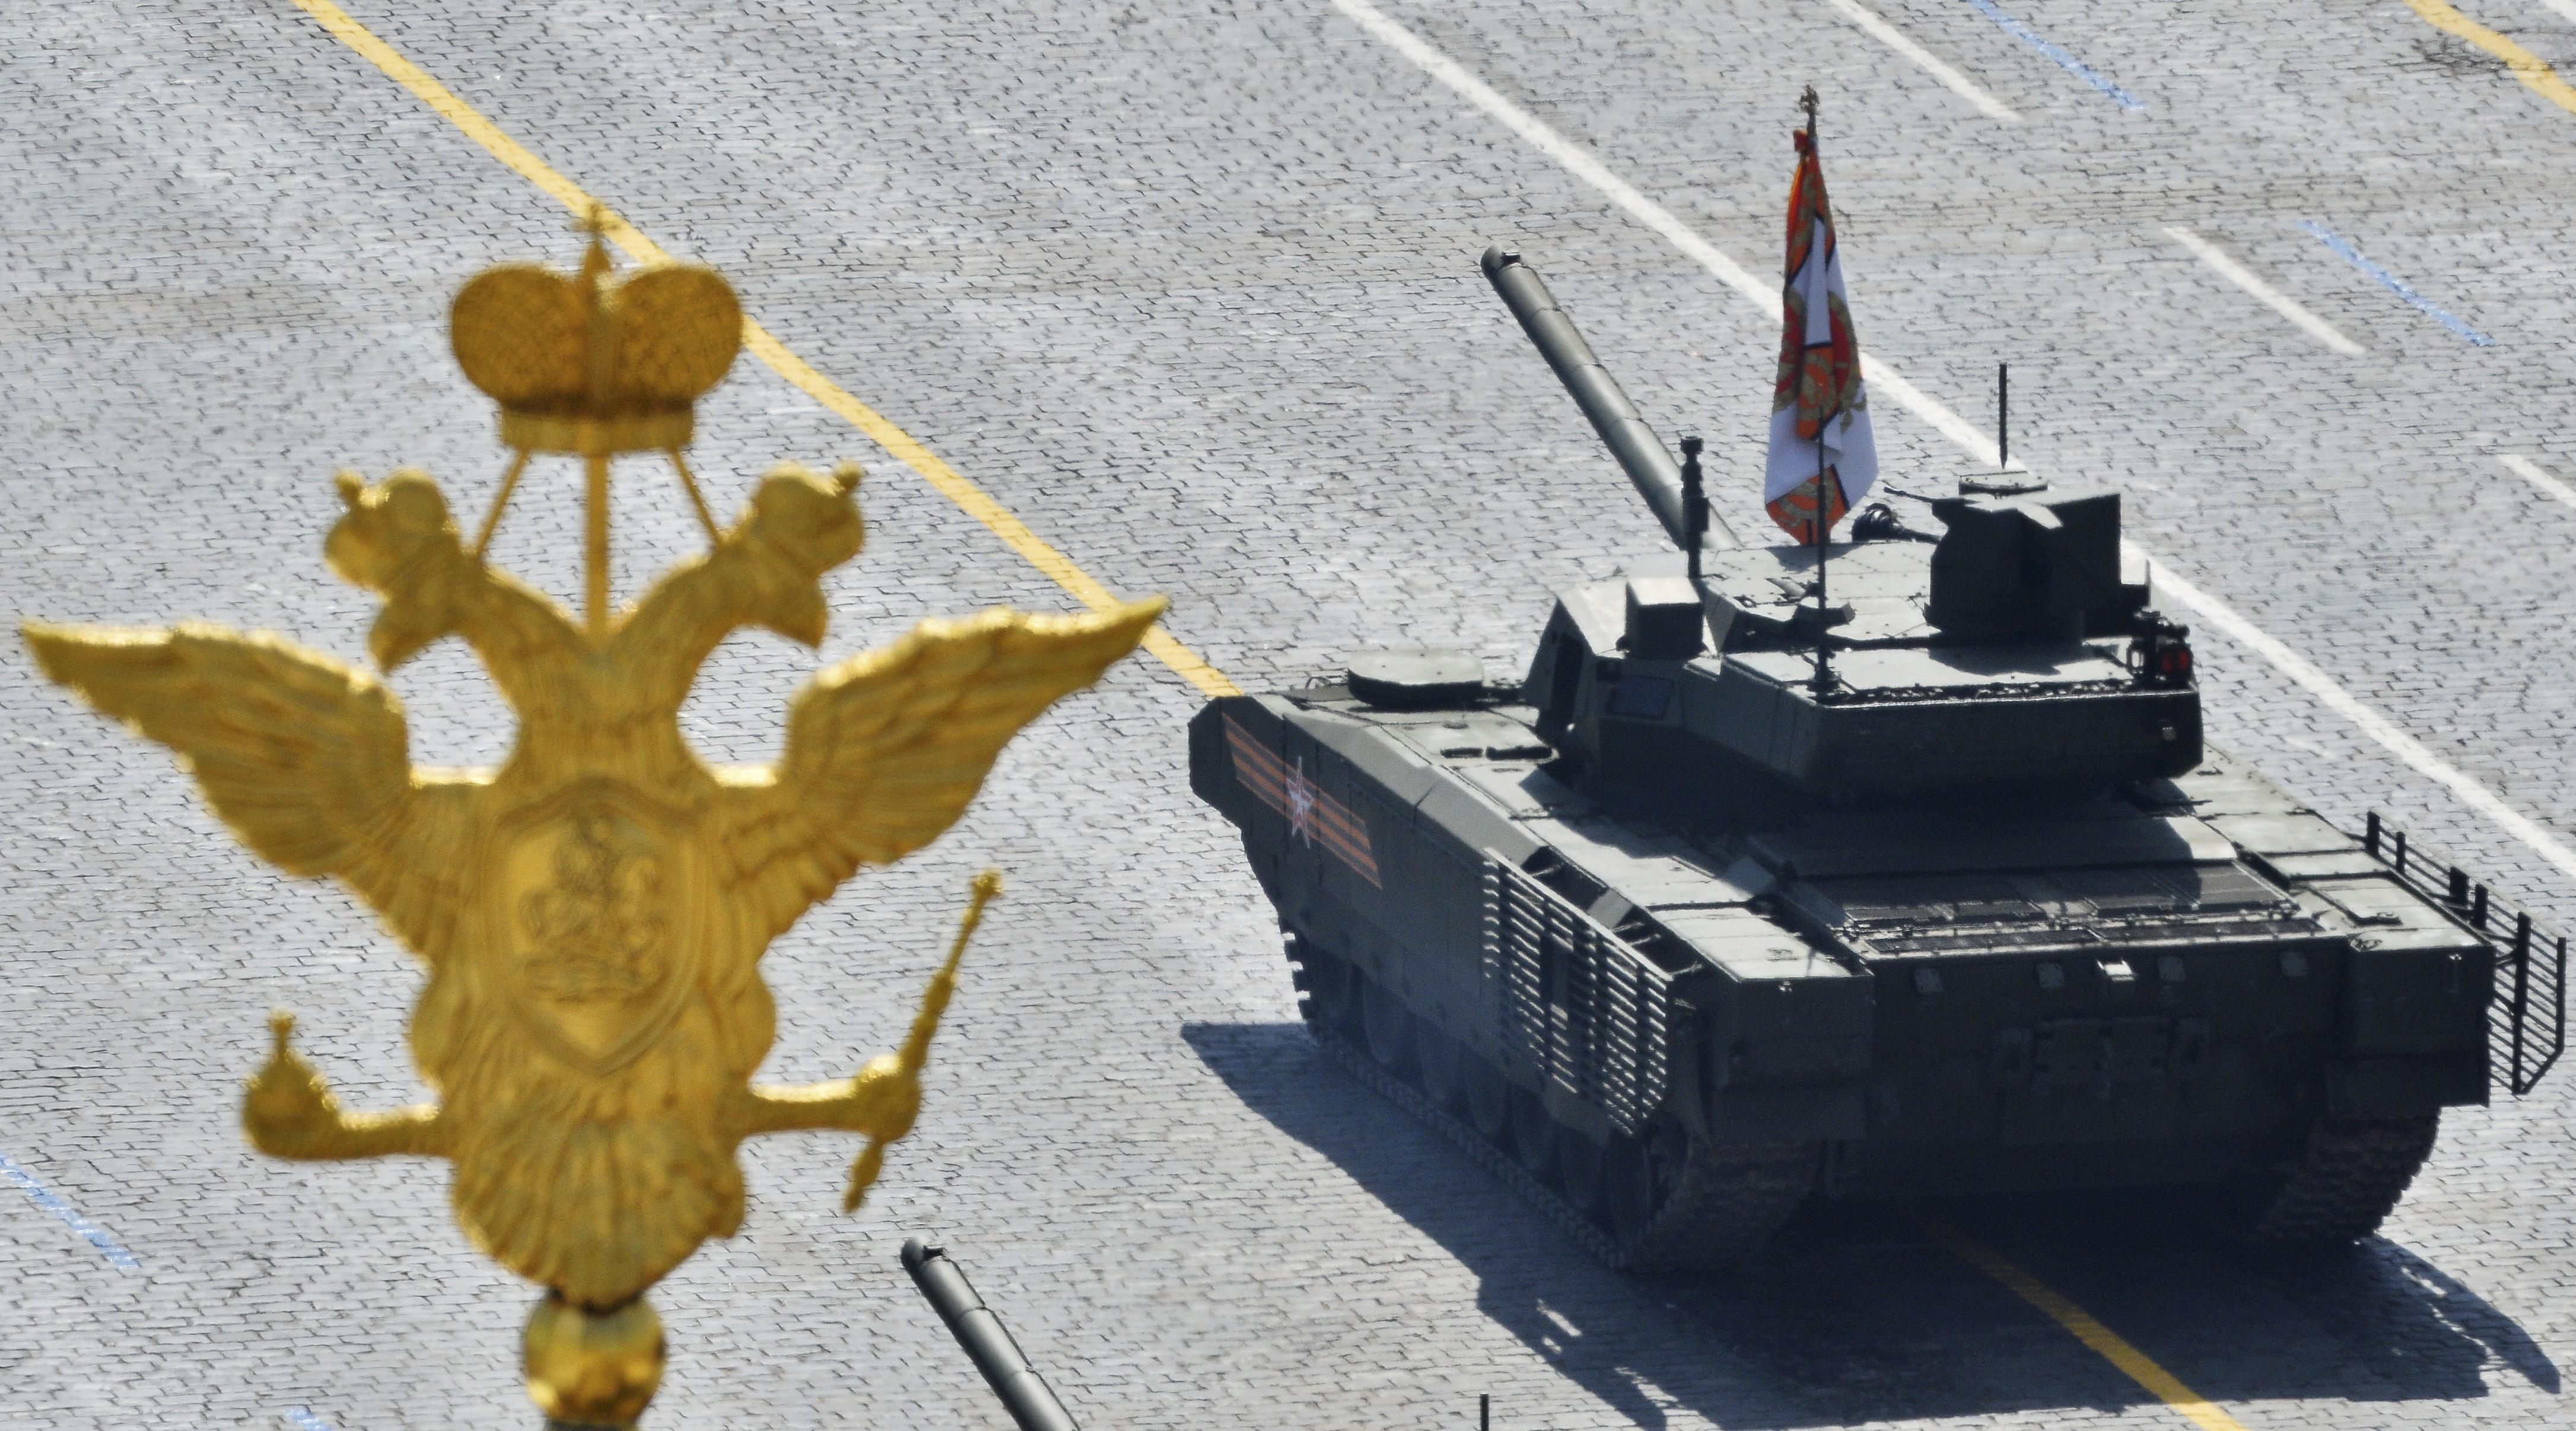 """Уралвагонзавод"" создал новый боеприпас для танка ""Армата"""